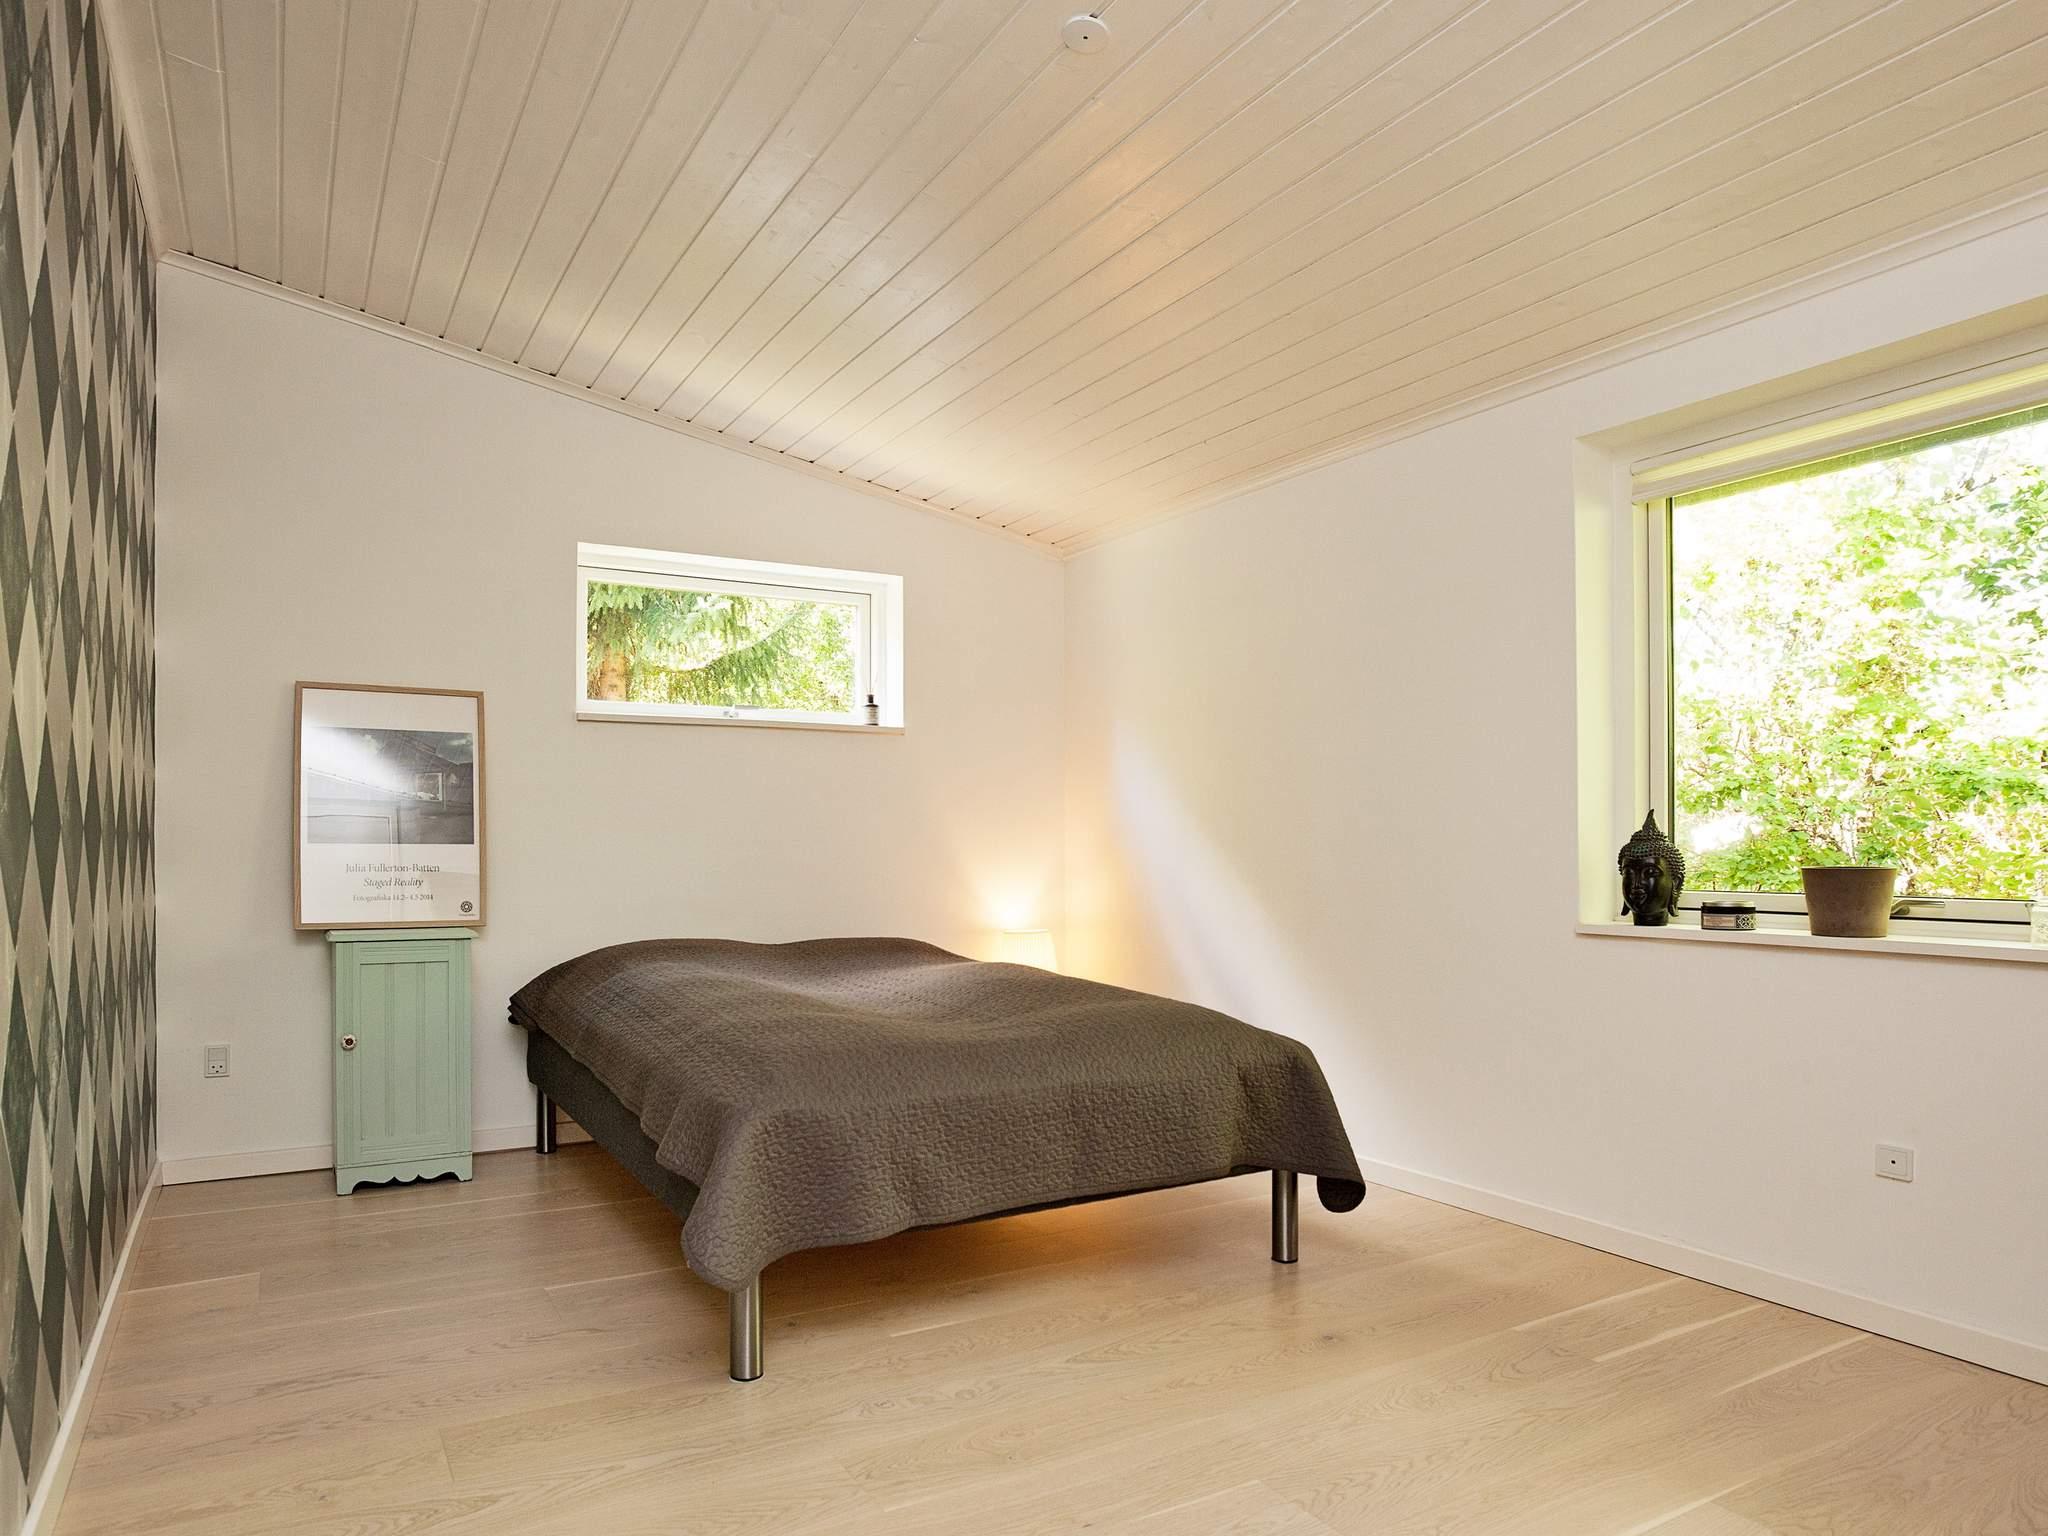 Ferienhaus Vejby Strand (1709460), Vejby, , Nordseeland, Dänemark, Bild 8